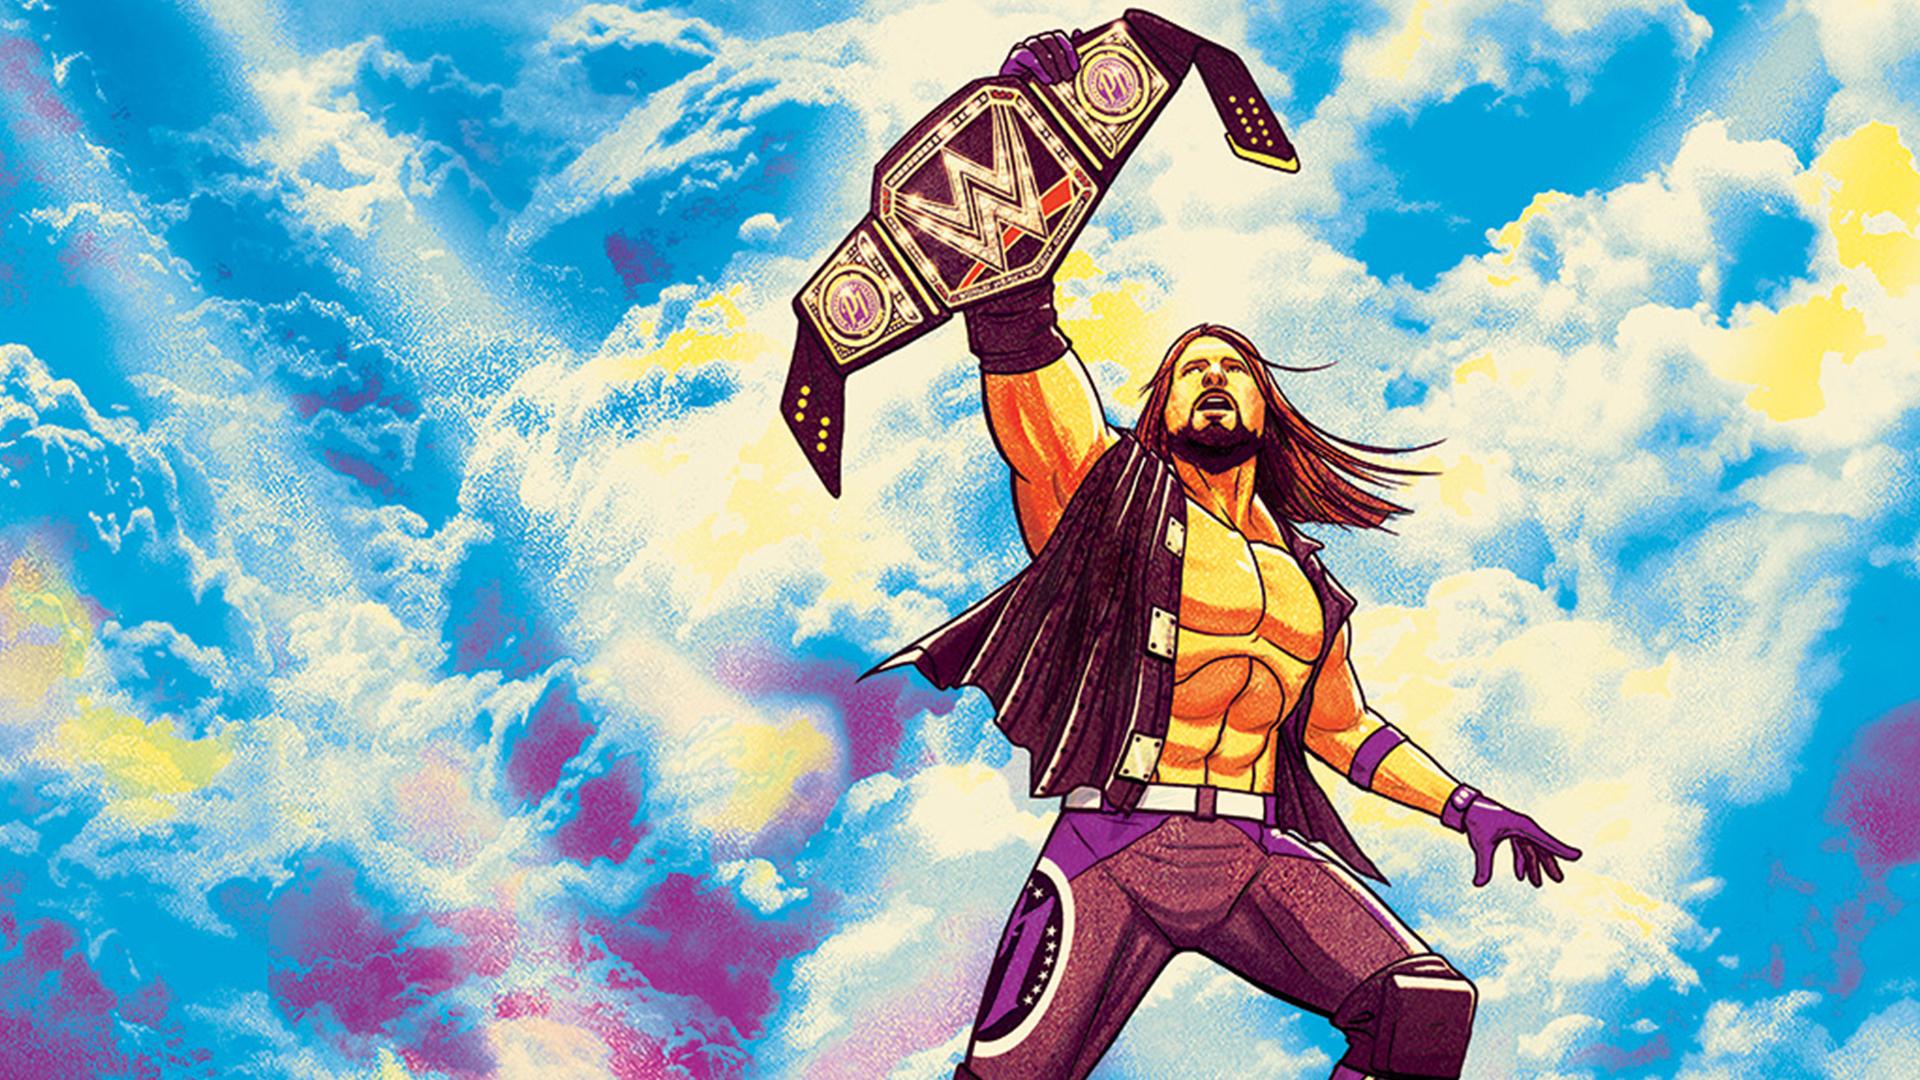 WWE Wallpaper – Stay Updated